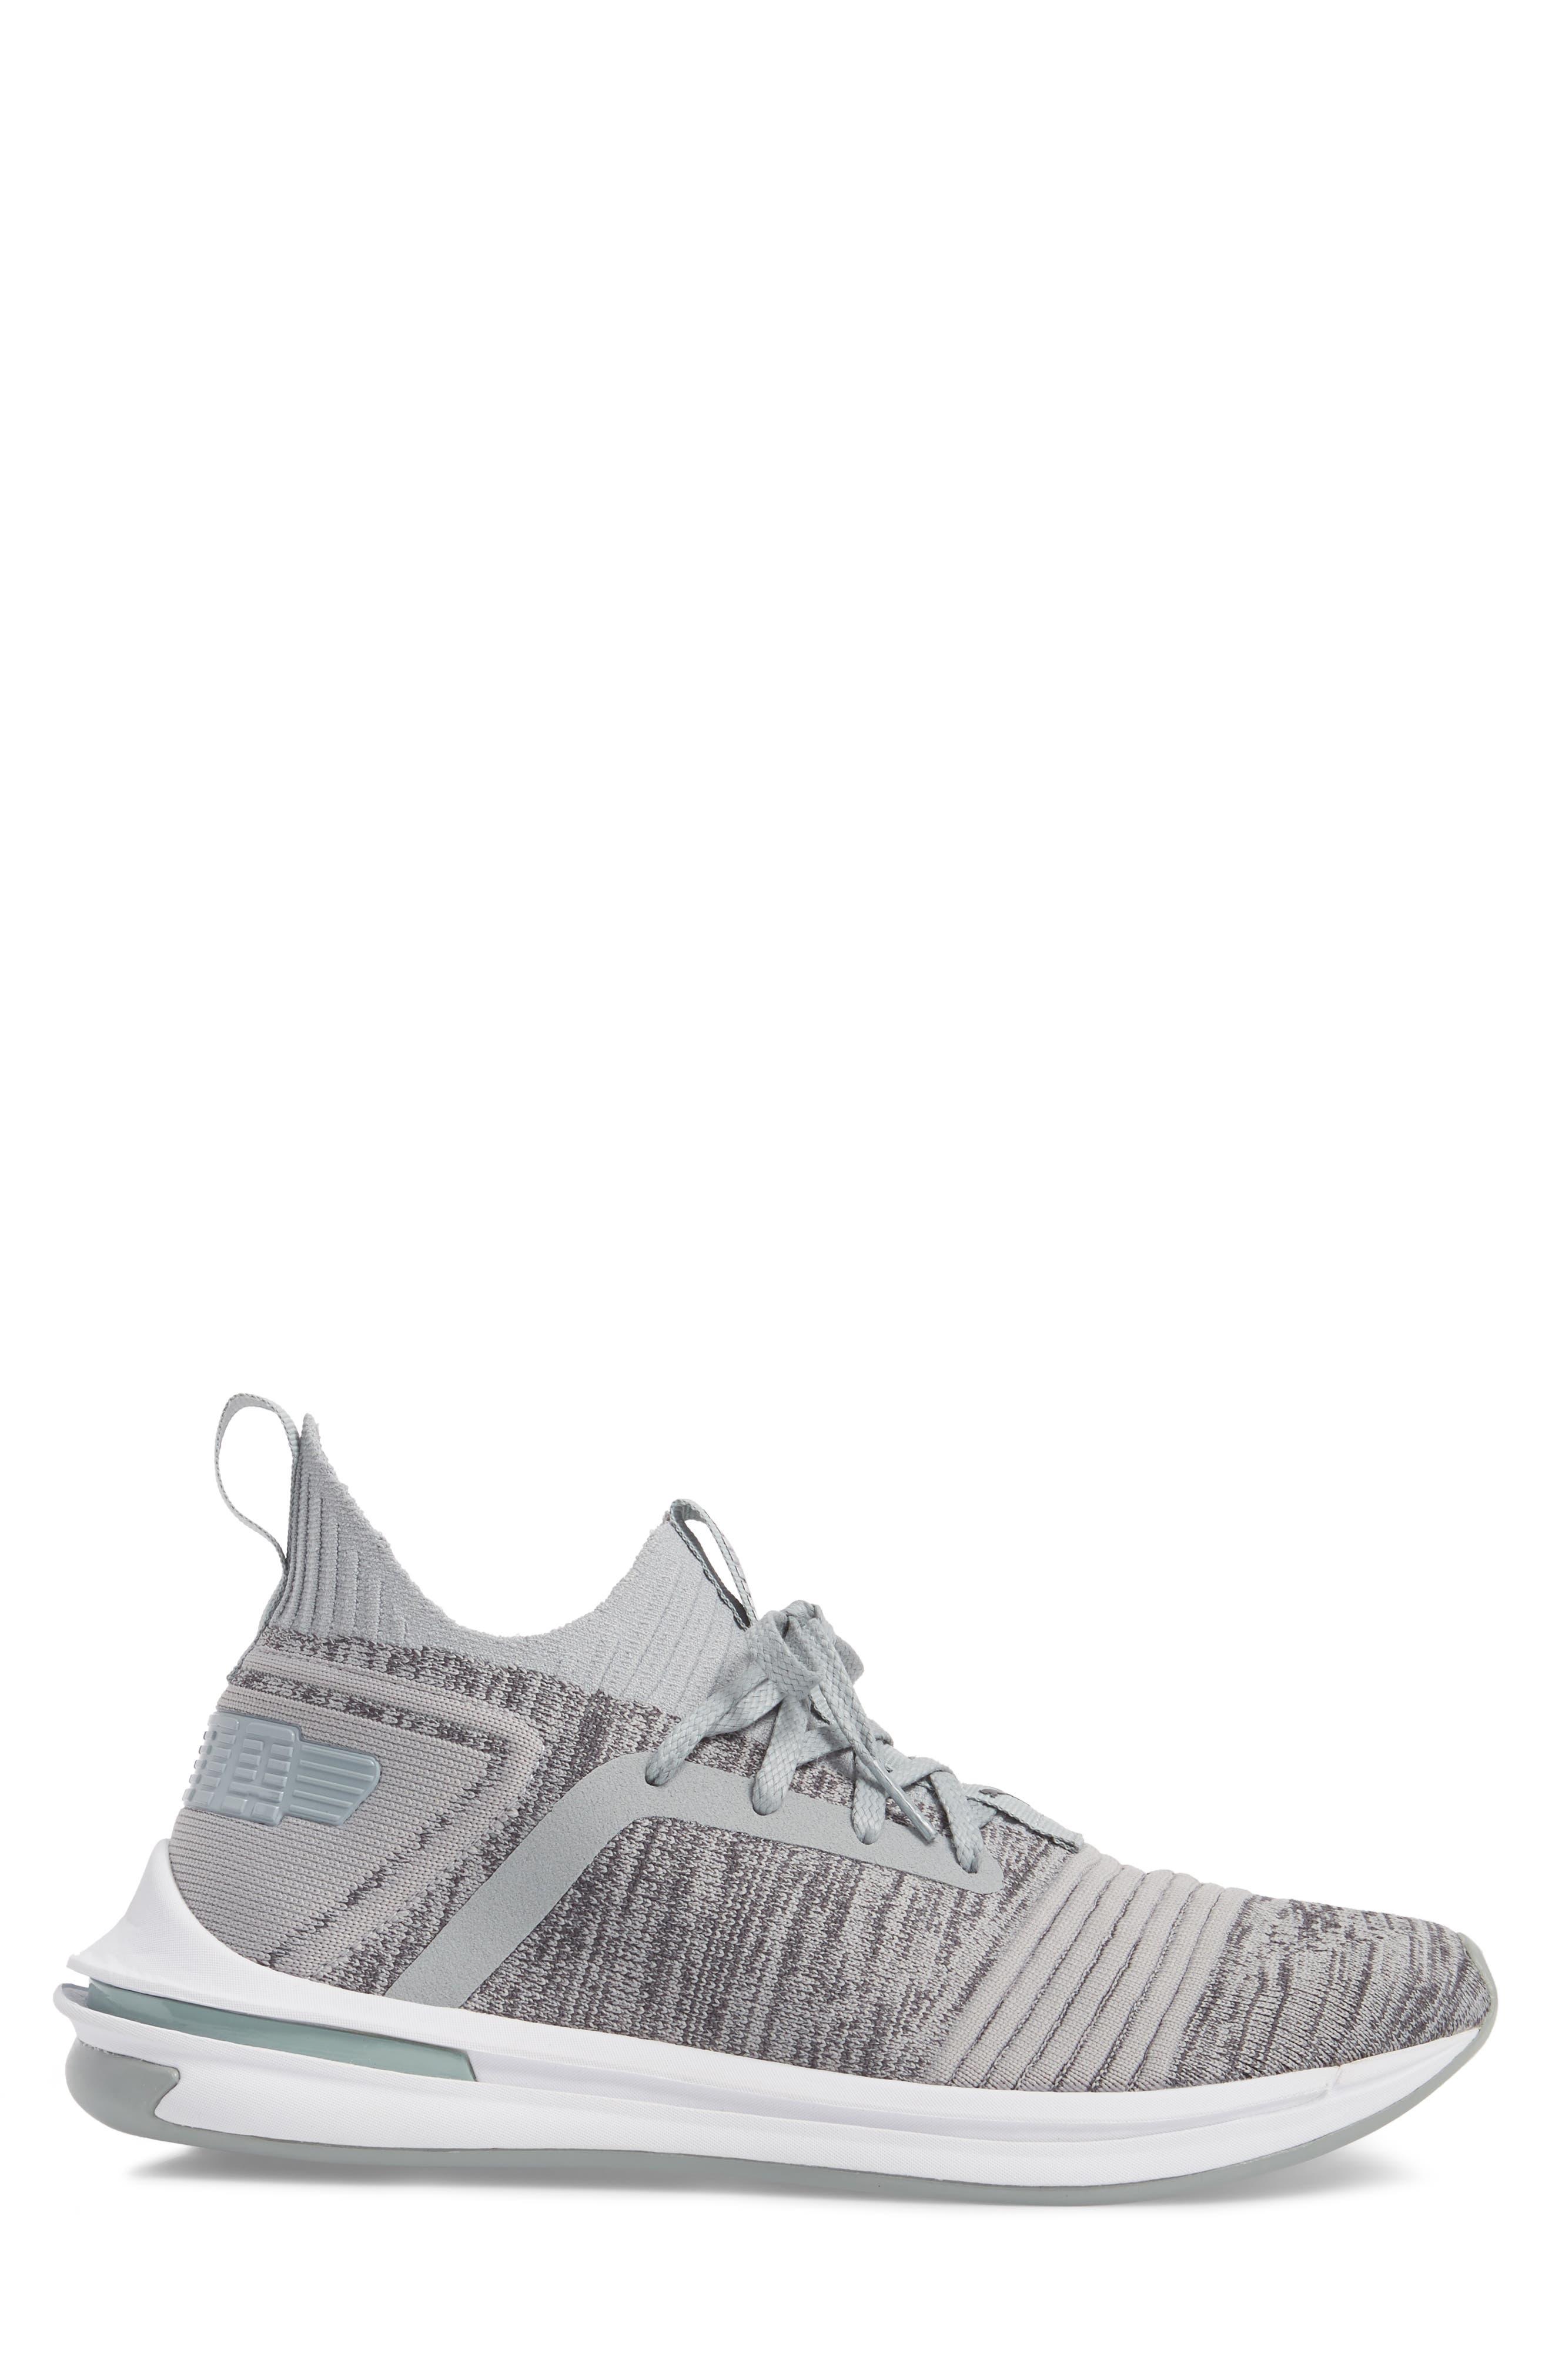 IGNITE Limitless SR evoKNIT Sneaker,                             Alternate thumbnail 3, color,                             Quarry